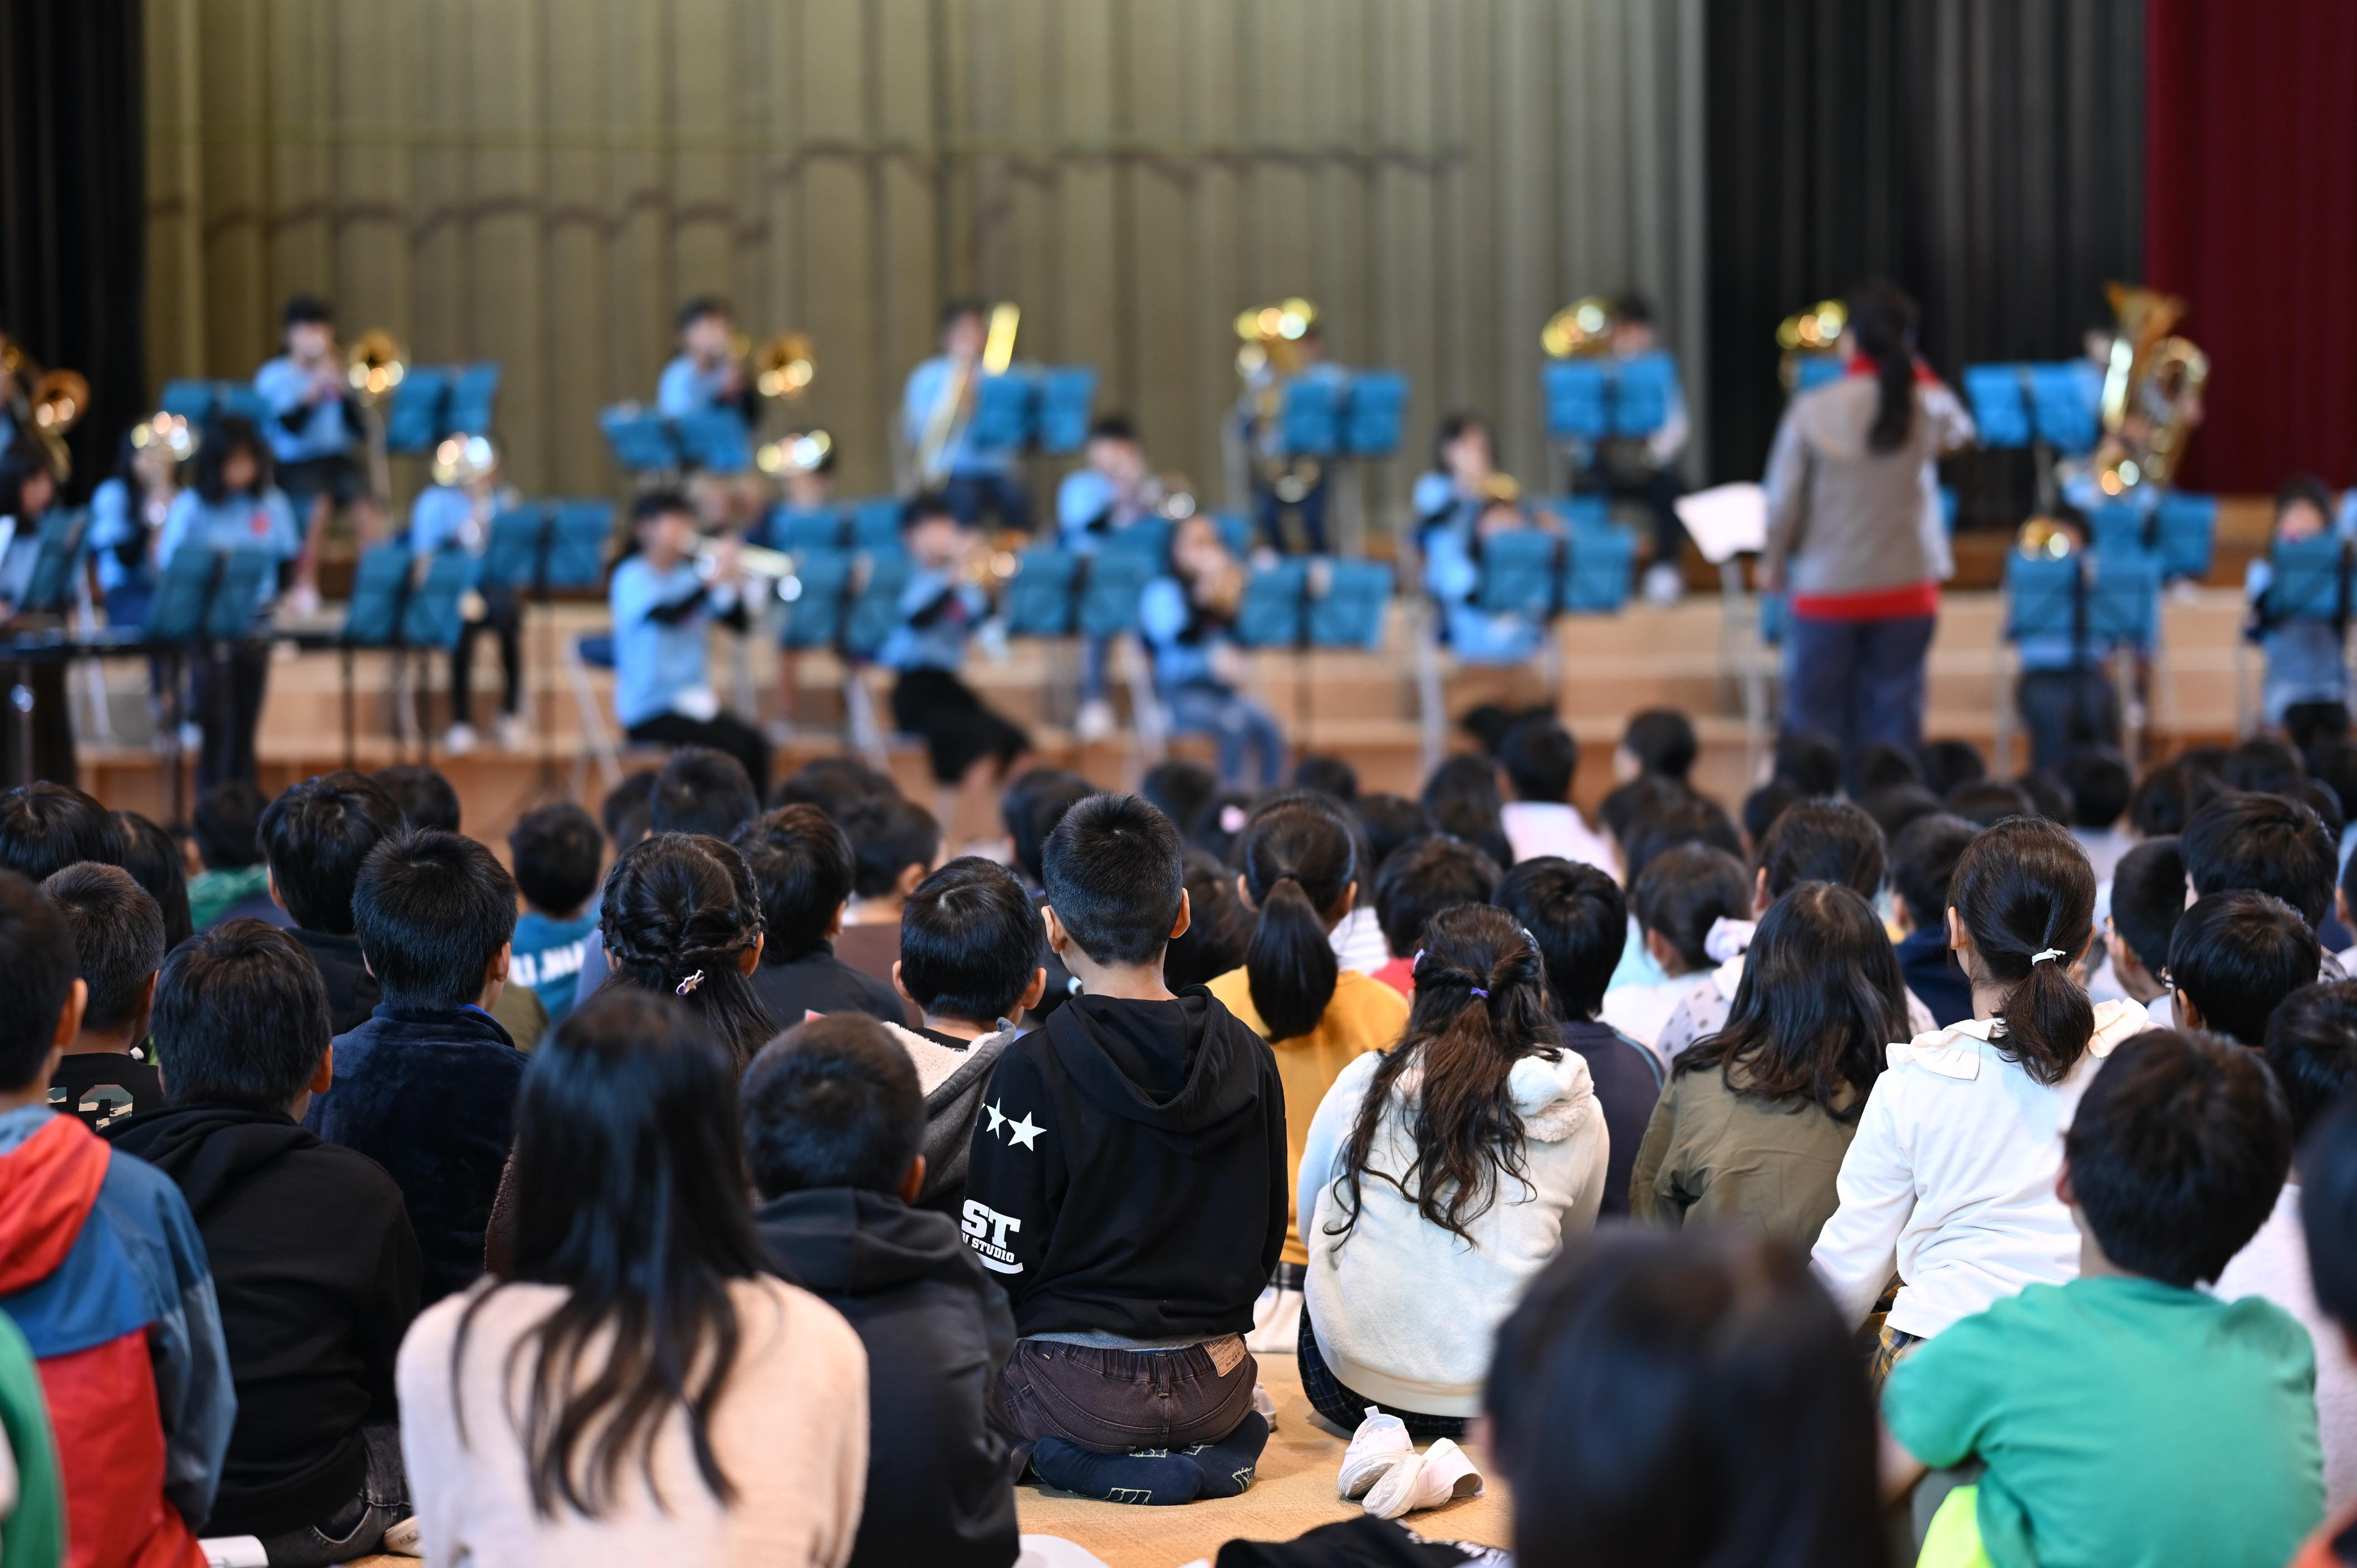 https://blog.izumo.ed.jp/nagahama-sho/DSC_7309.JPG